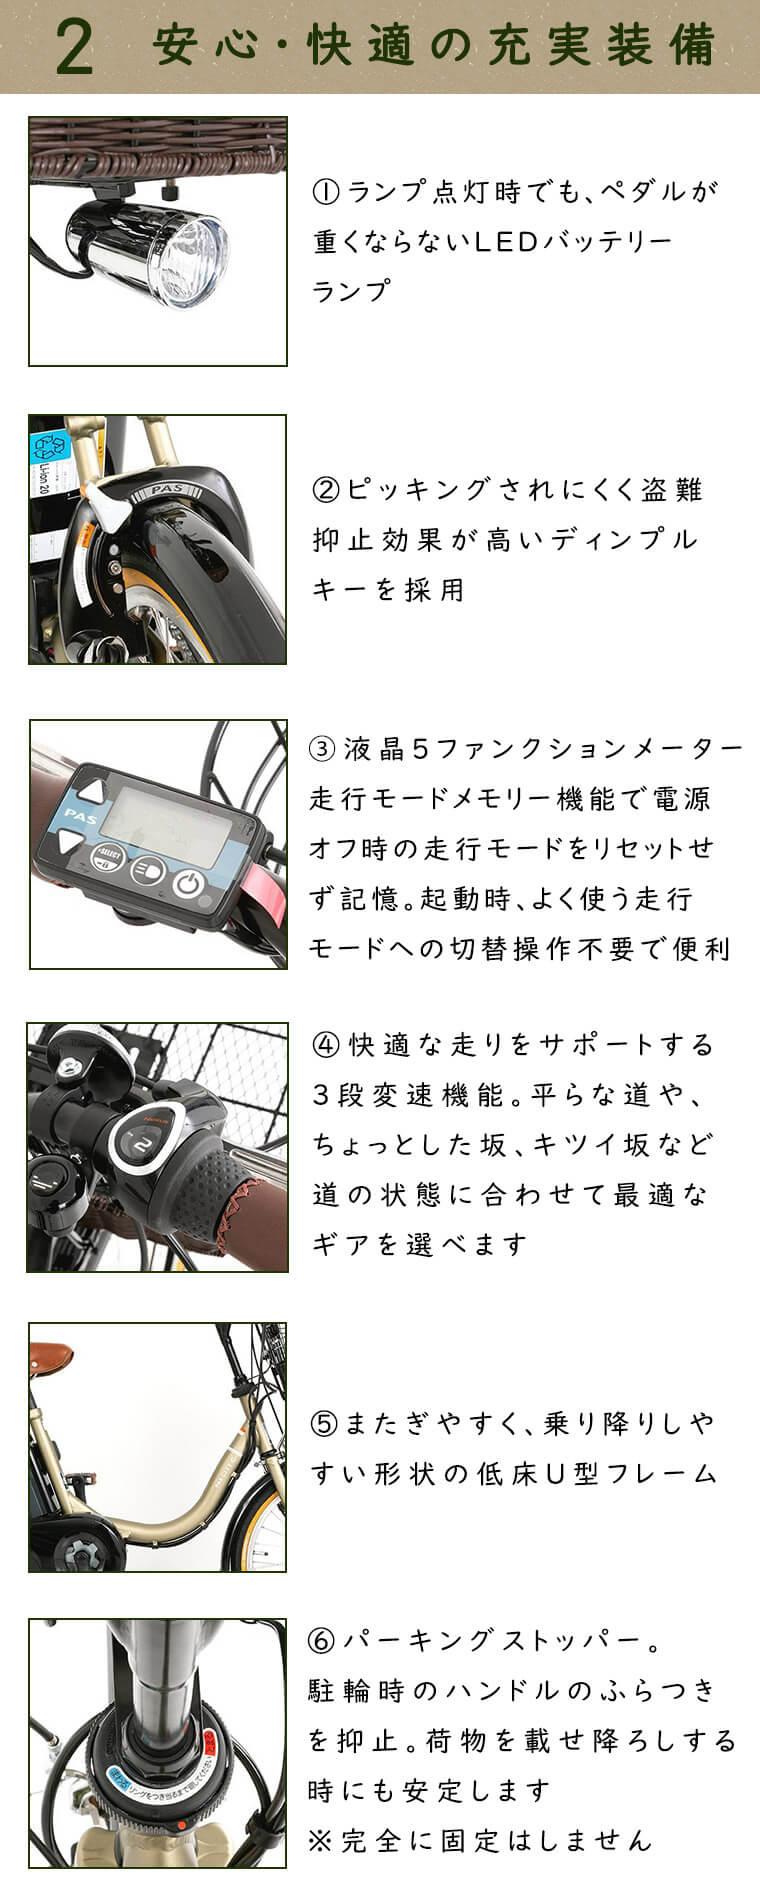 YAMAHAのPAS CITY-Cの電動自転車装備